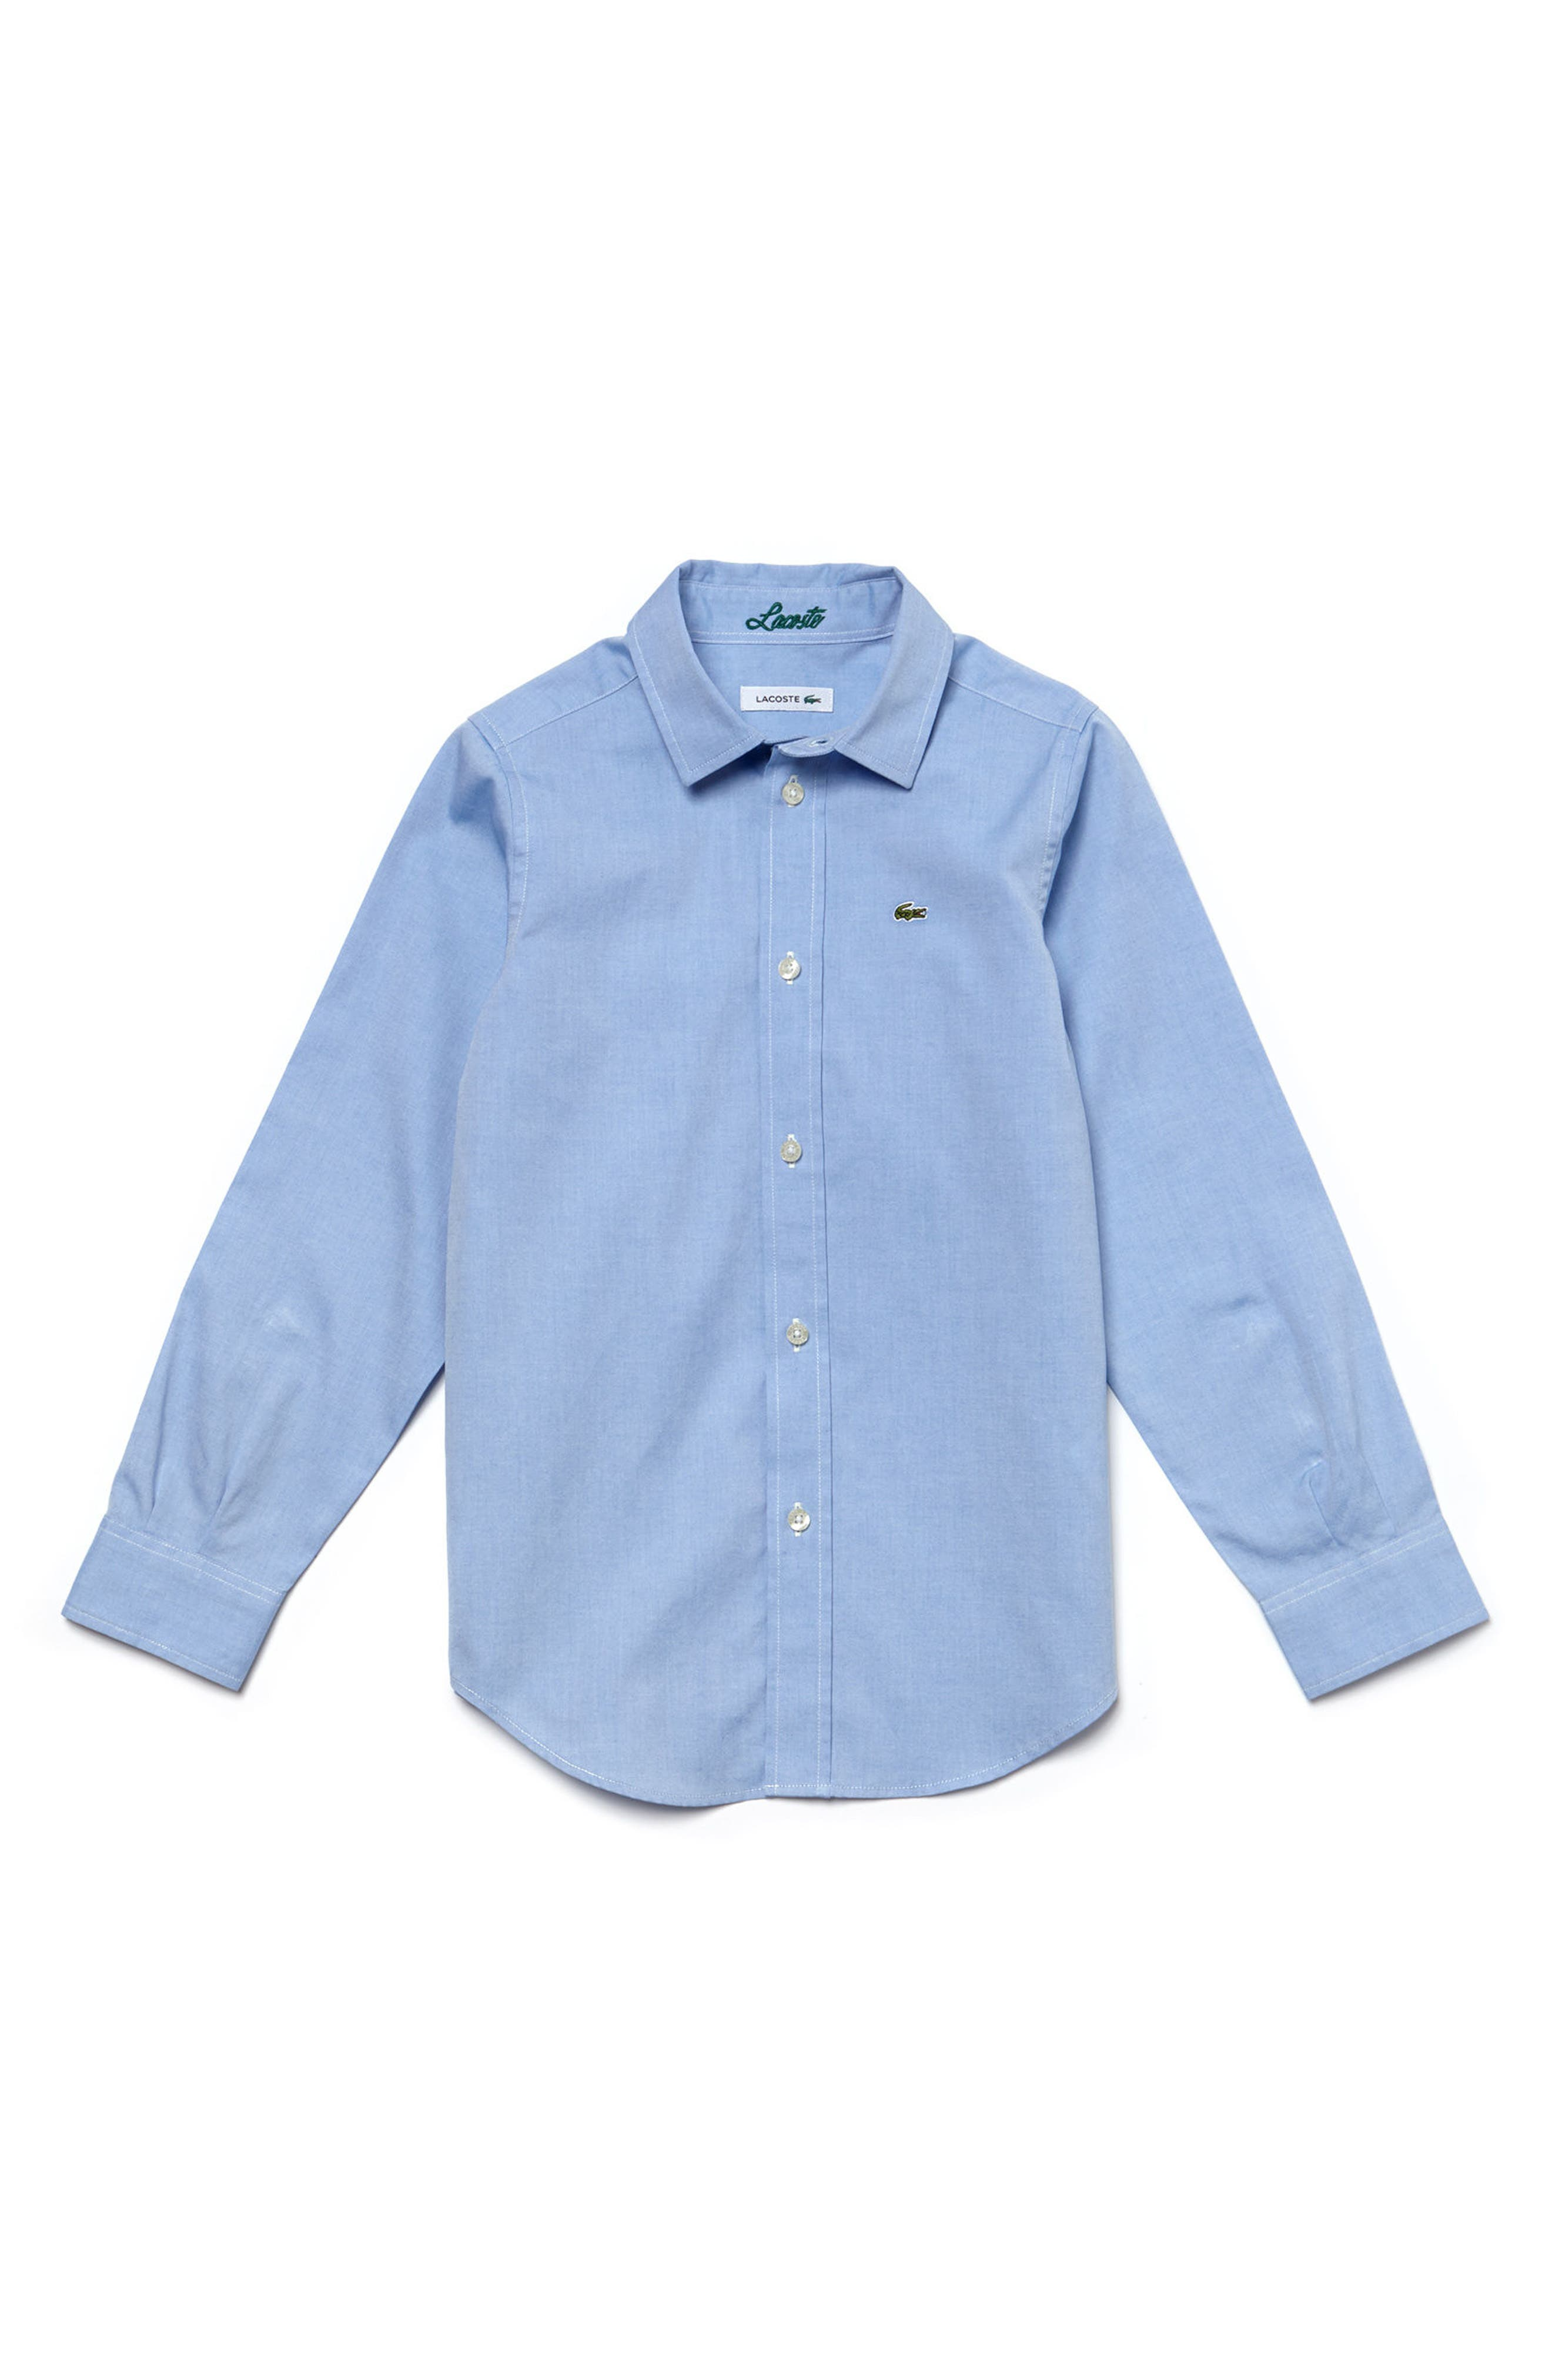 Main Image - Lacoste Classic Oxford Shirt (Little Boys)